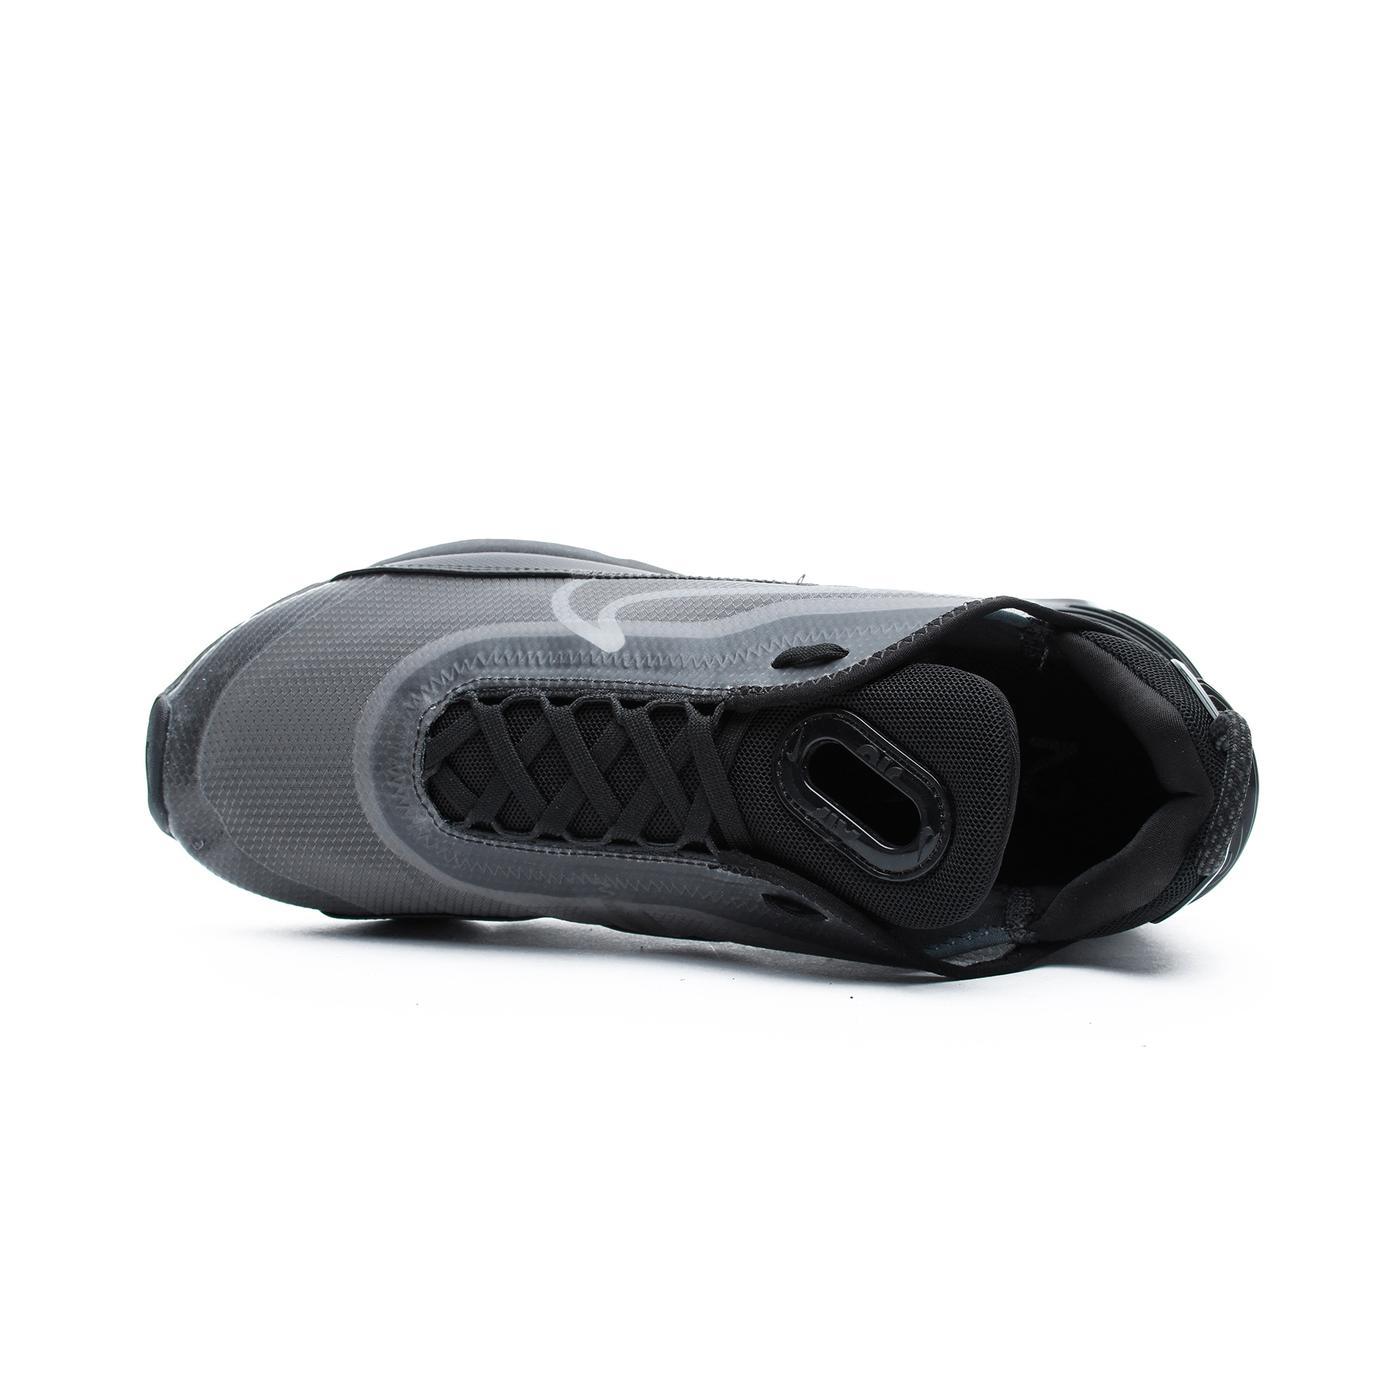 Nike Air Max 2090 Erkek Siyah Spor Ayakkabı